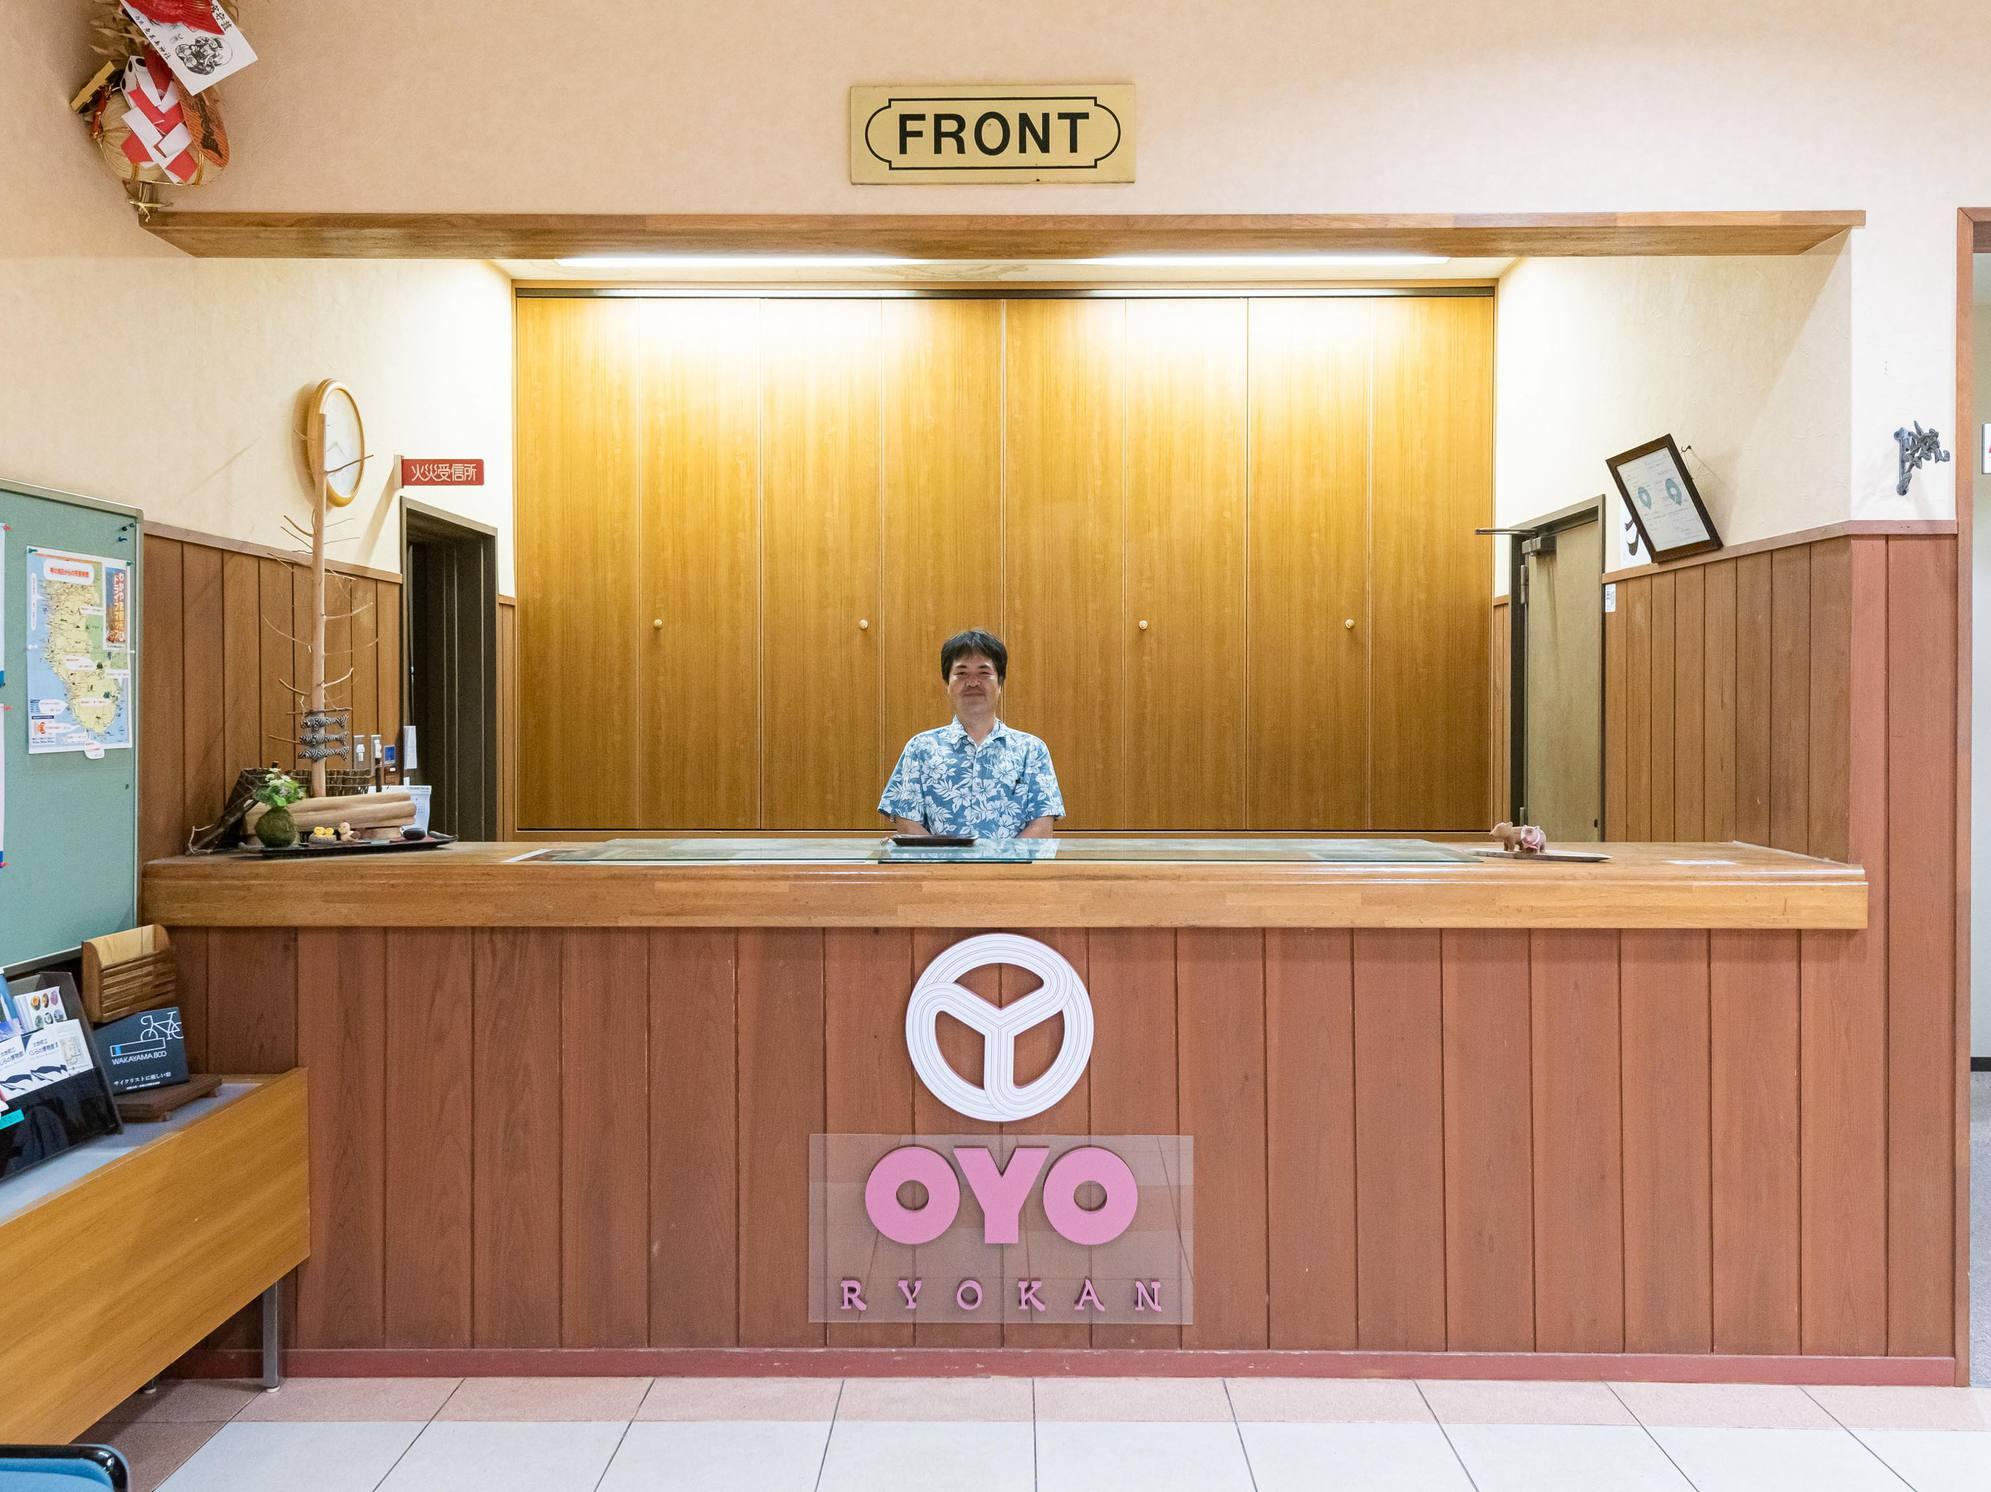 OYO旅館 琴の滝荘 すさみ町 関連画像 6枚目 楽天トラベル提供